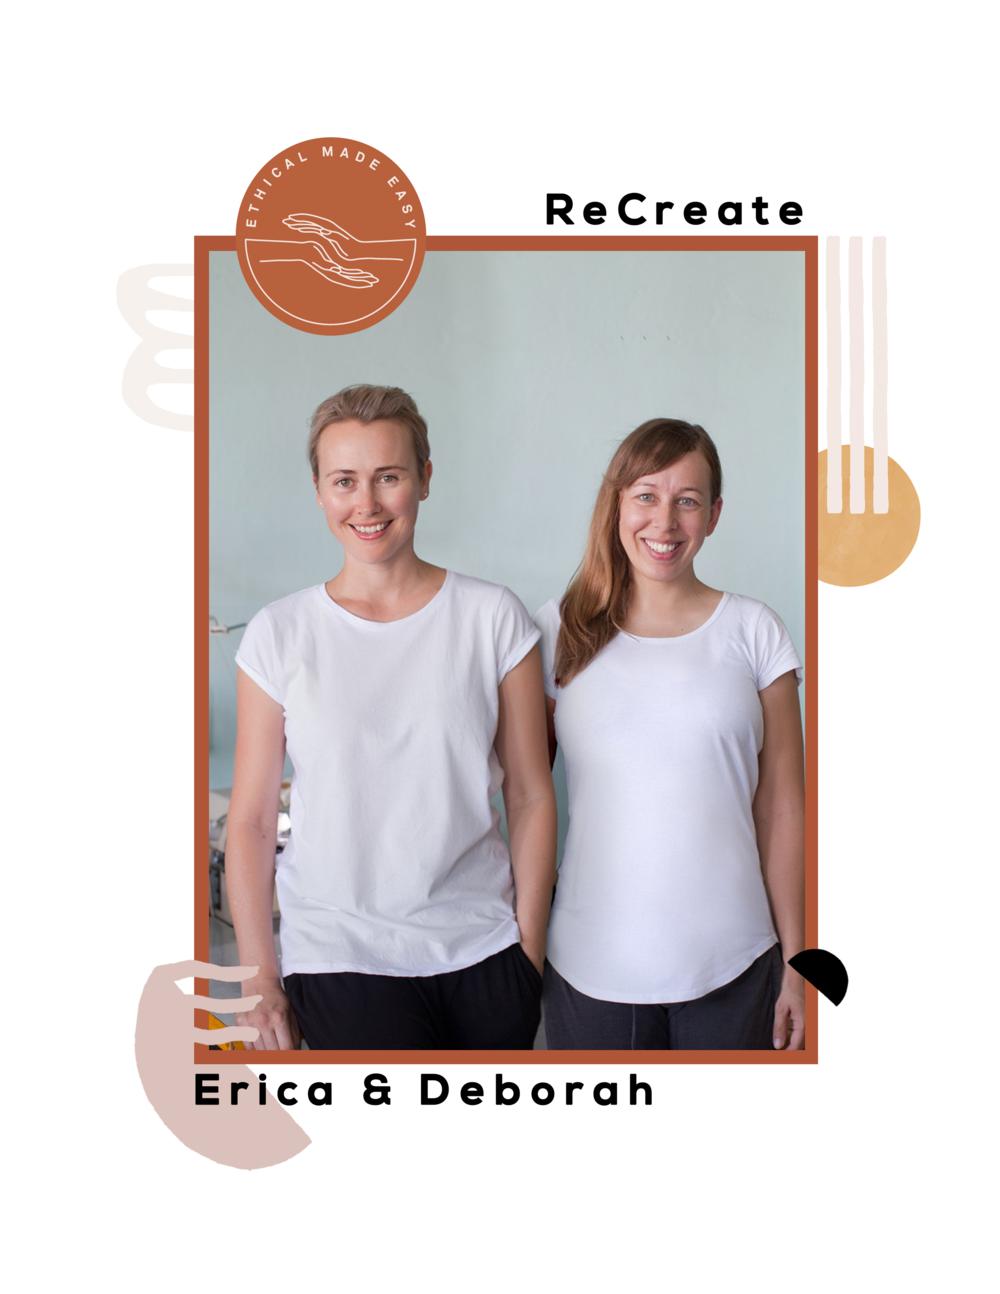 recreatefounders.png